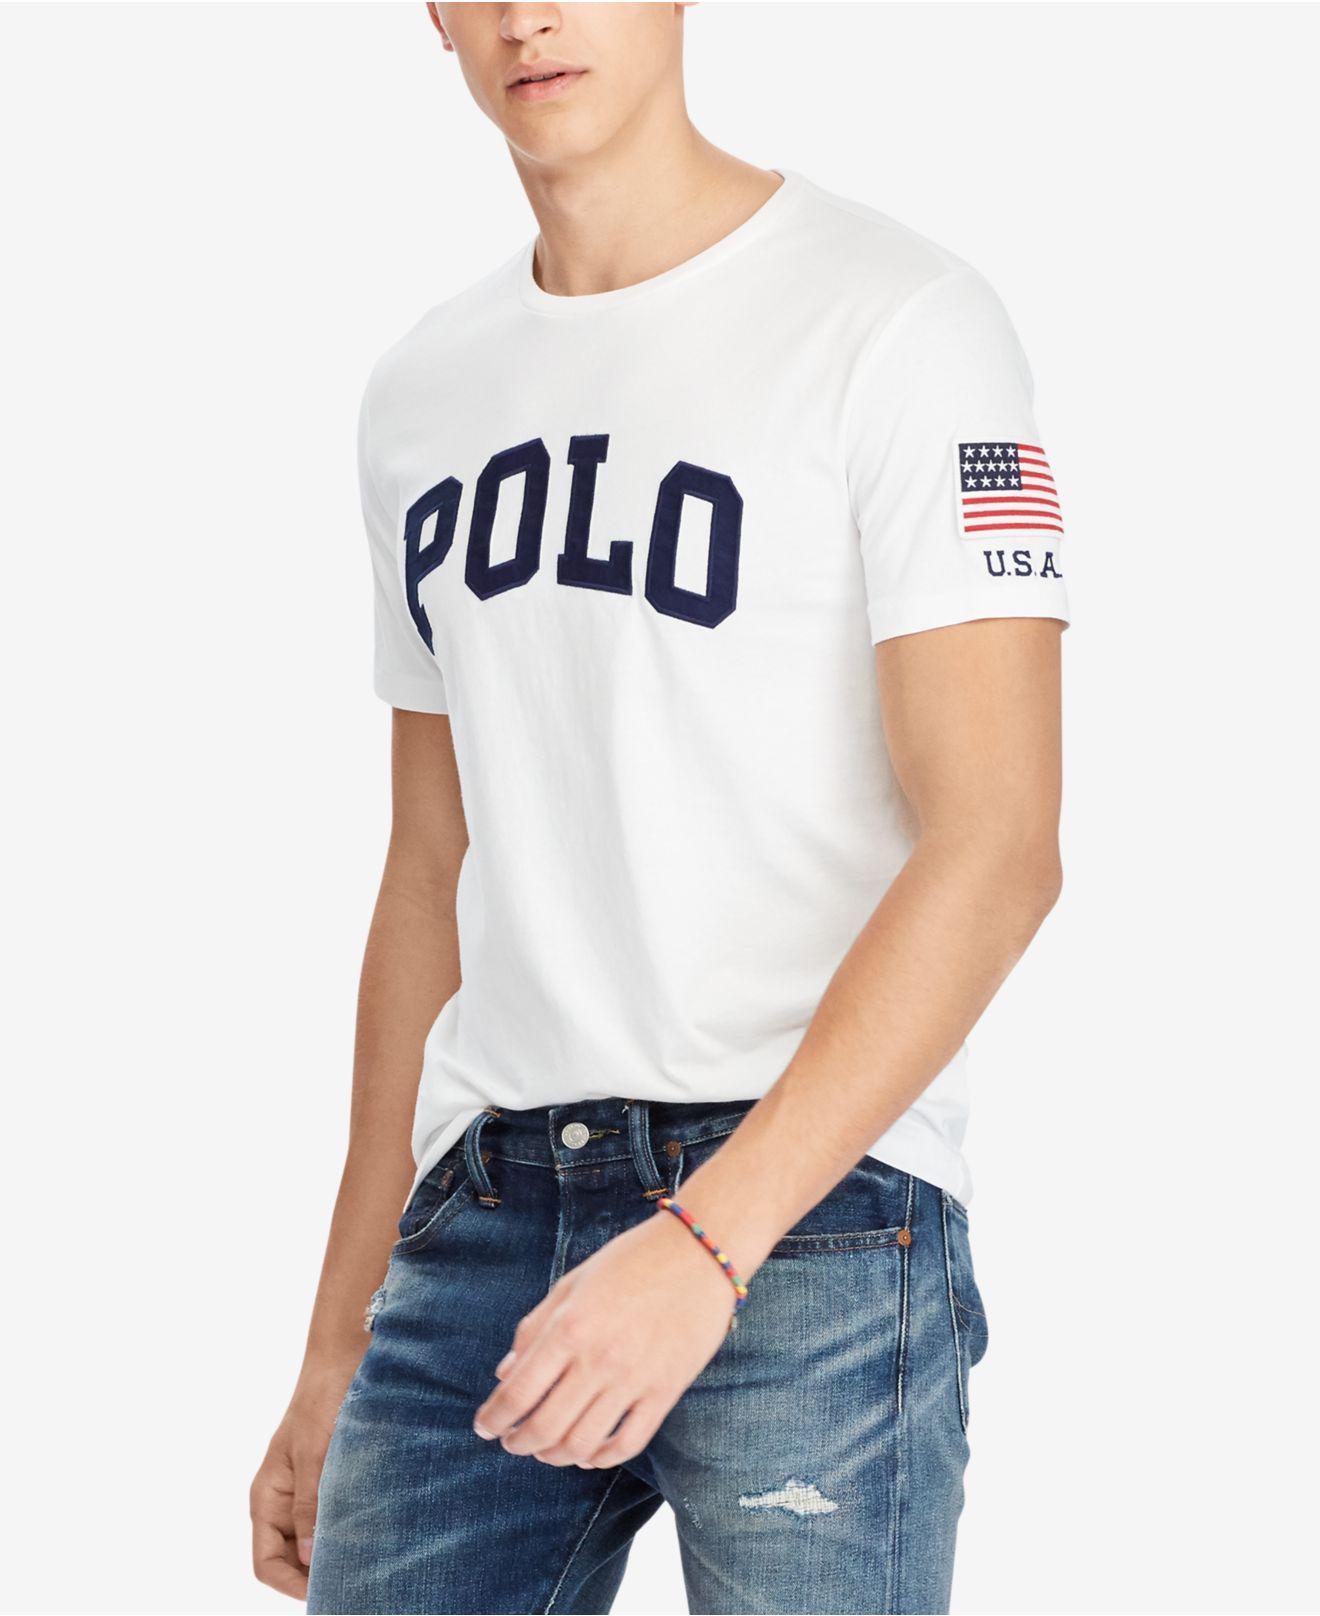 polo ralph lauren tee shirts sale Shop Clothing & Shoes Online